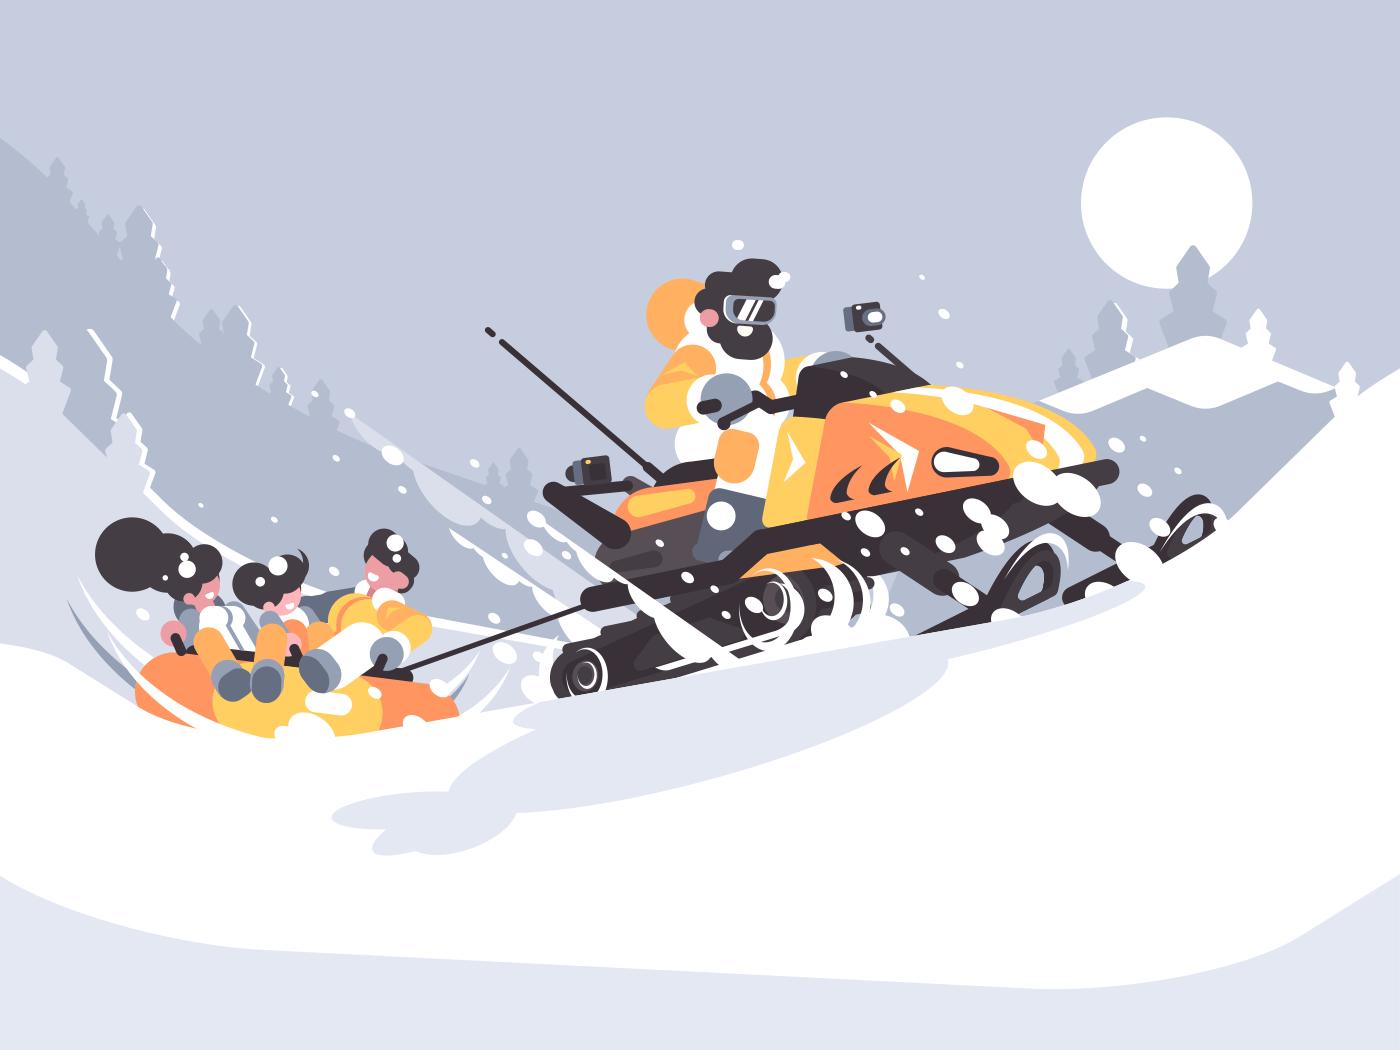 Man on snowmobile drives children. Winter fun in snow. Vector illustration